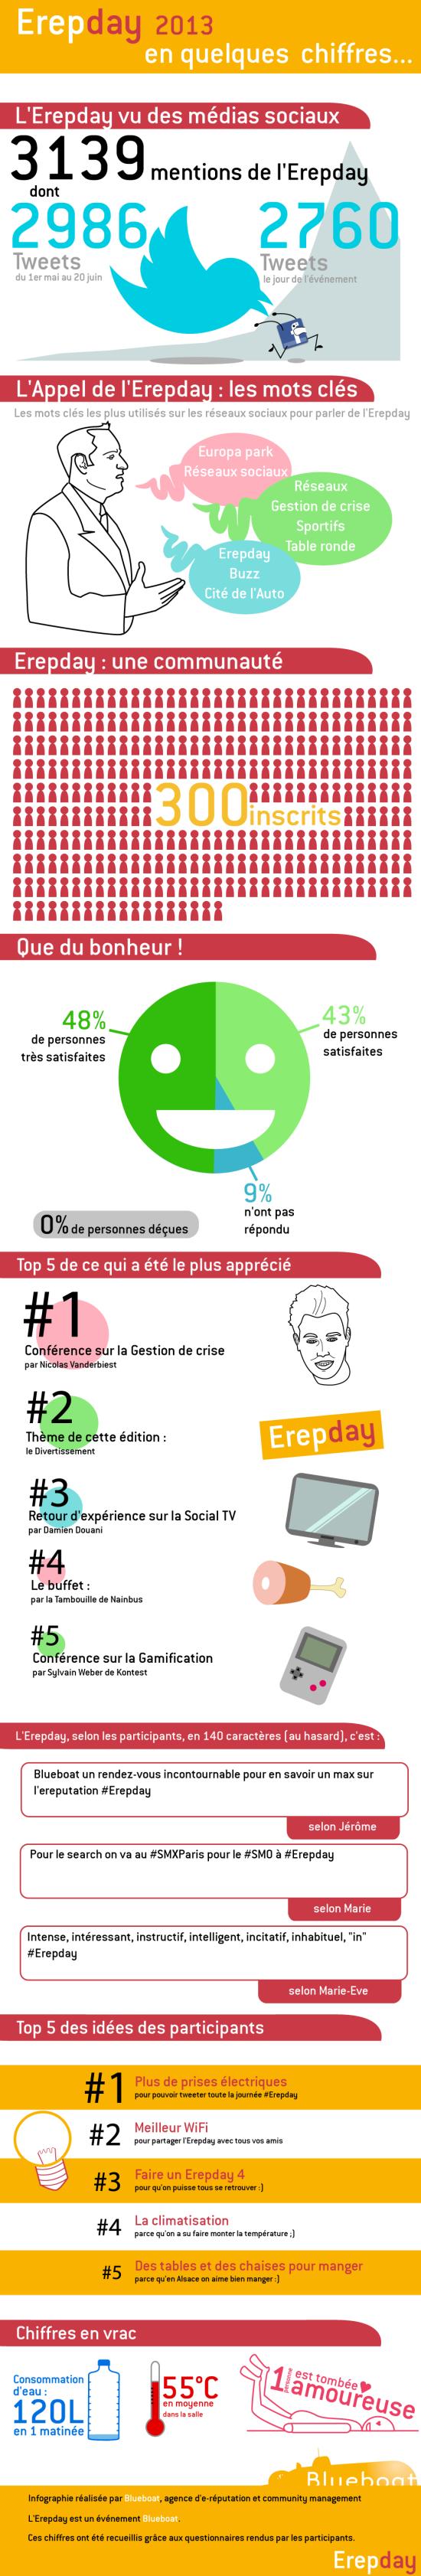 infographie-erepday-2013